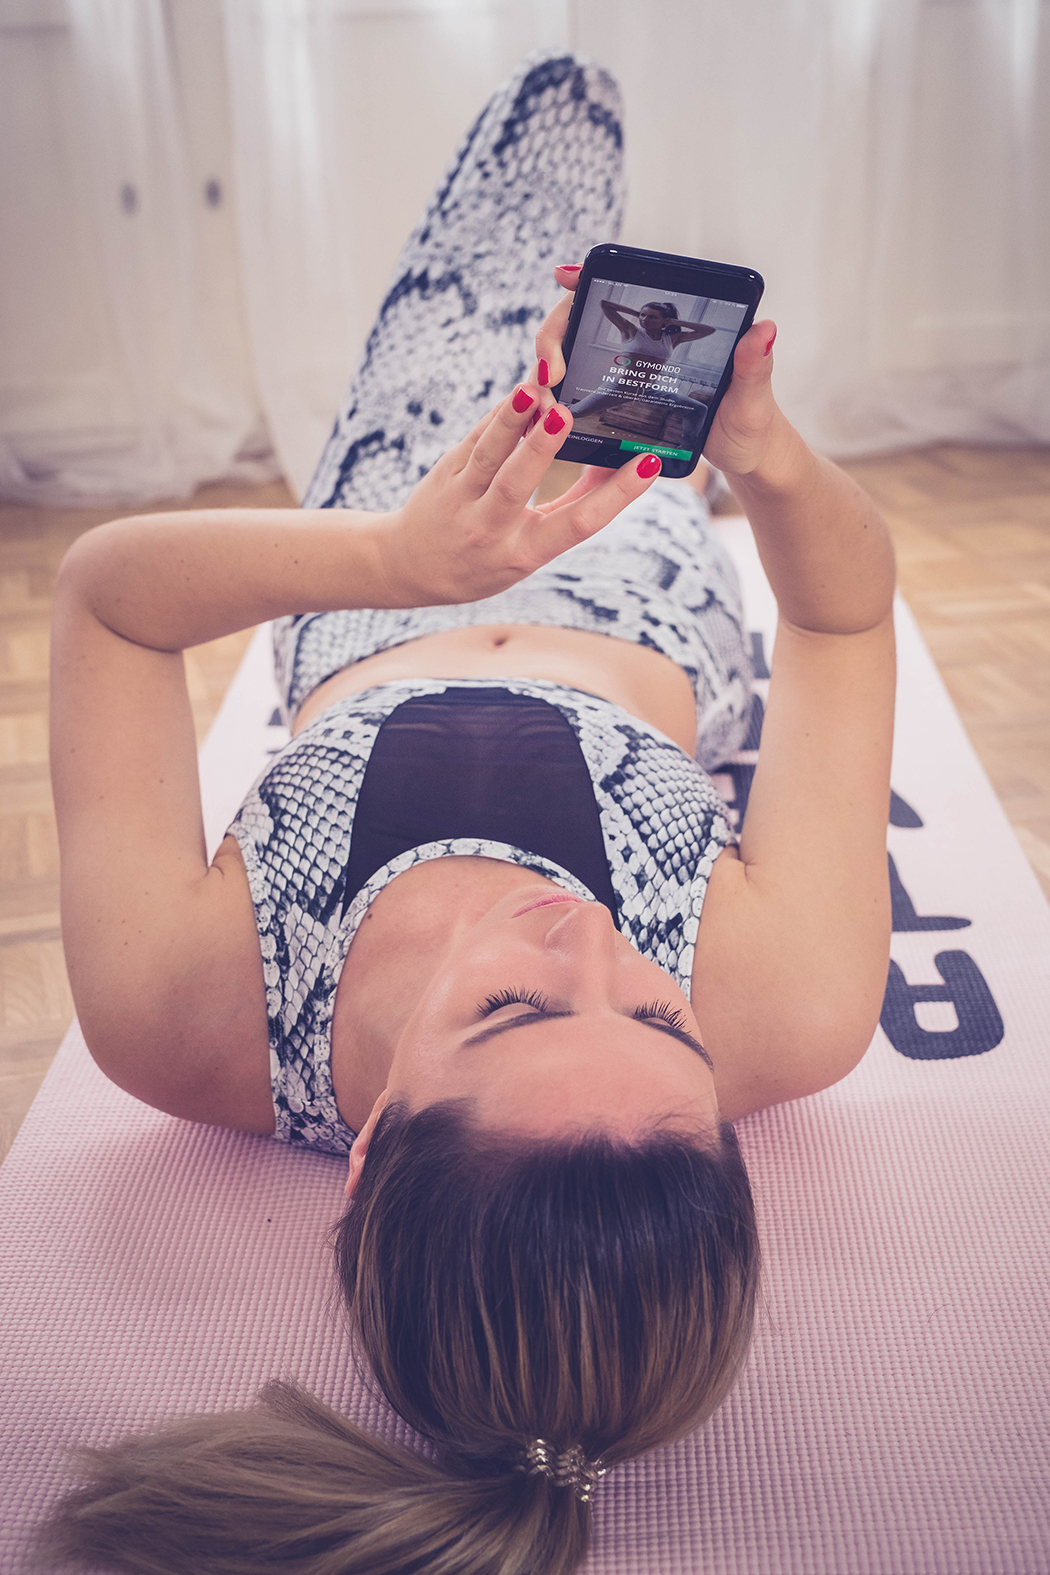 Fitnessblog-Fitnessblogger-Fitness-Blog-Blogger-Gymondo-Gutschein-Rabatt-Discount-Lindarella-Hometraining-Homeworkout-23-web